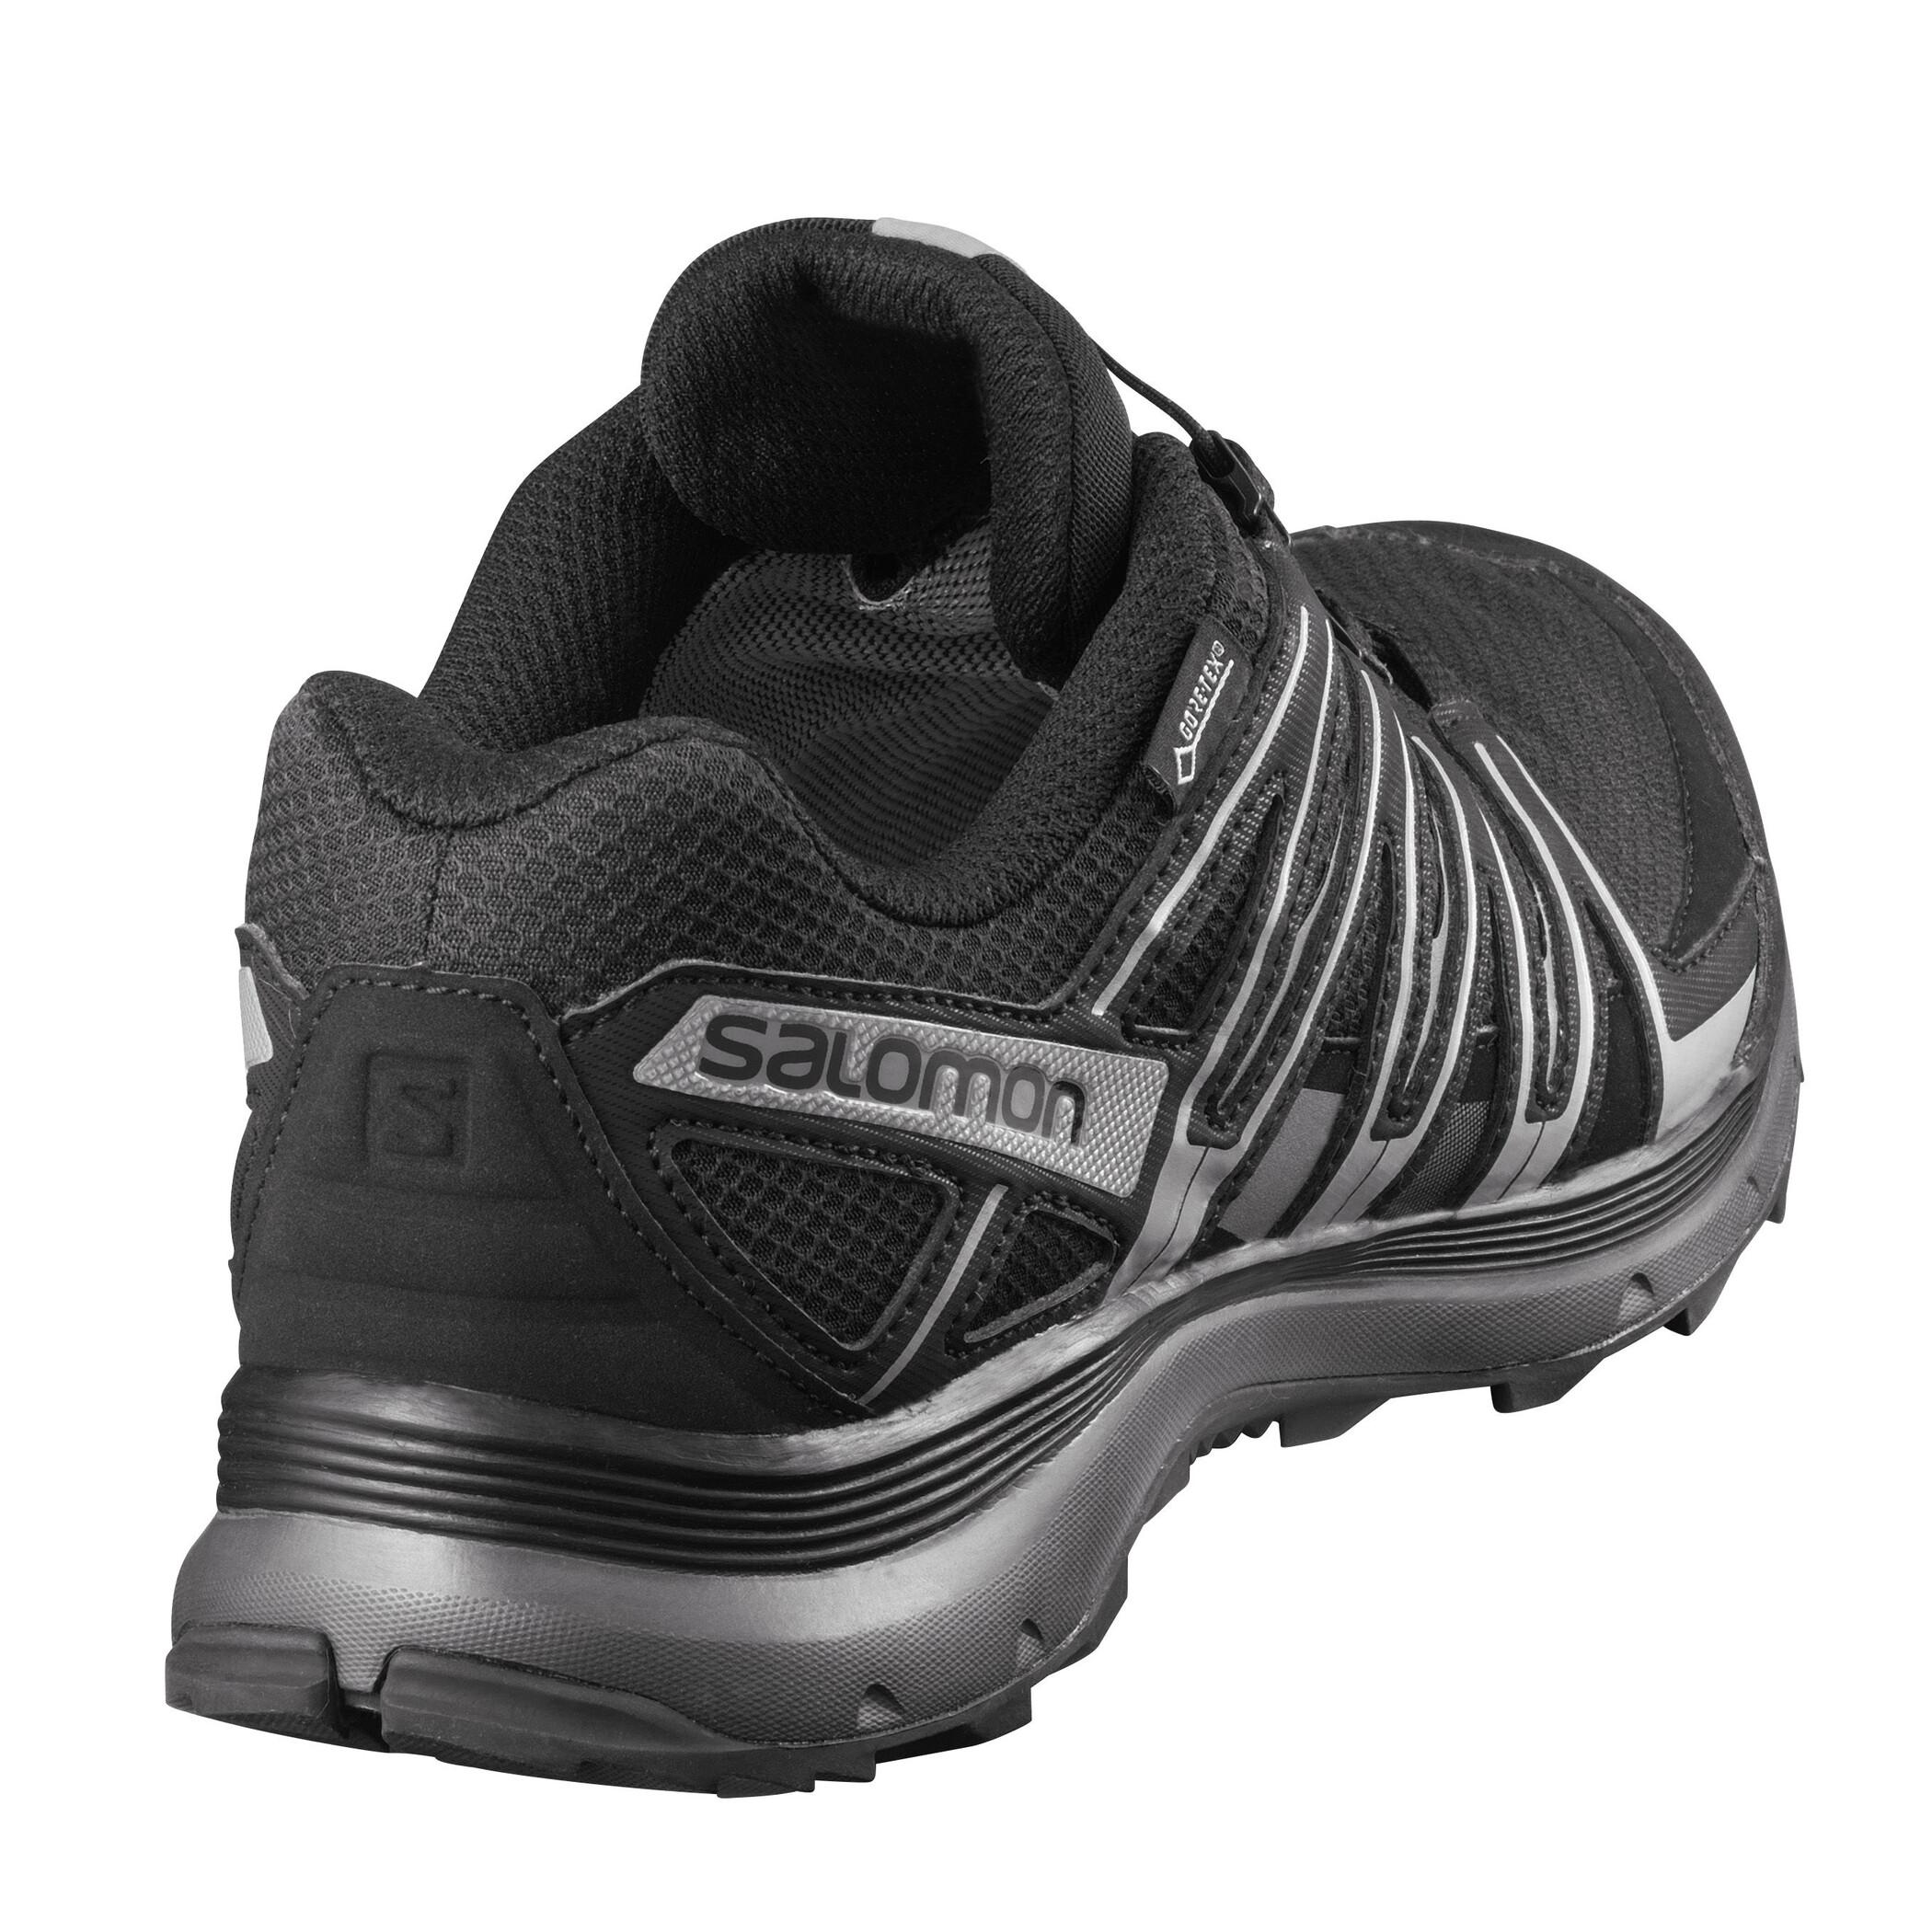 Salomon XA Lite GTX Trailrunning Schuhe Herren online kaufen rYuxG